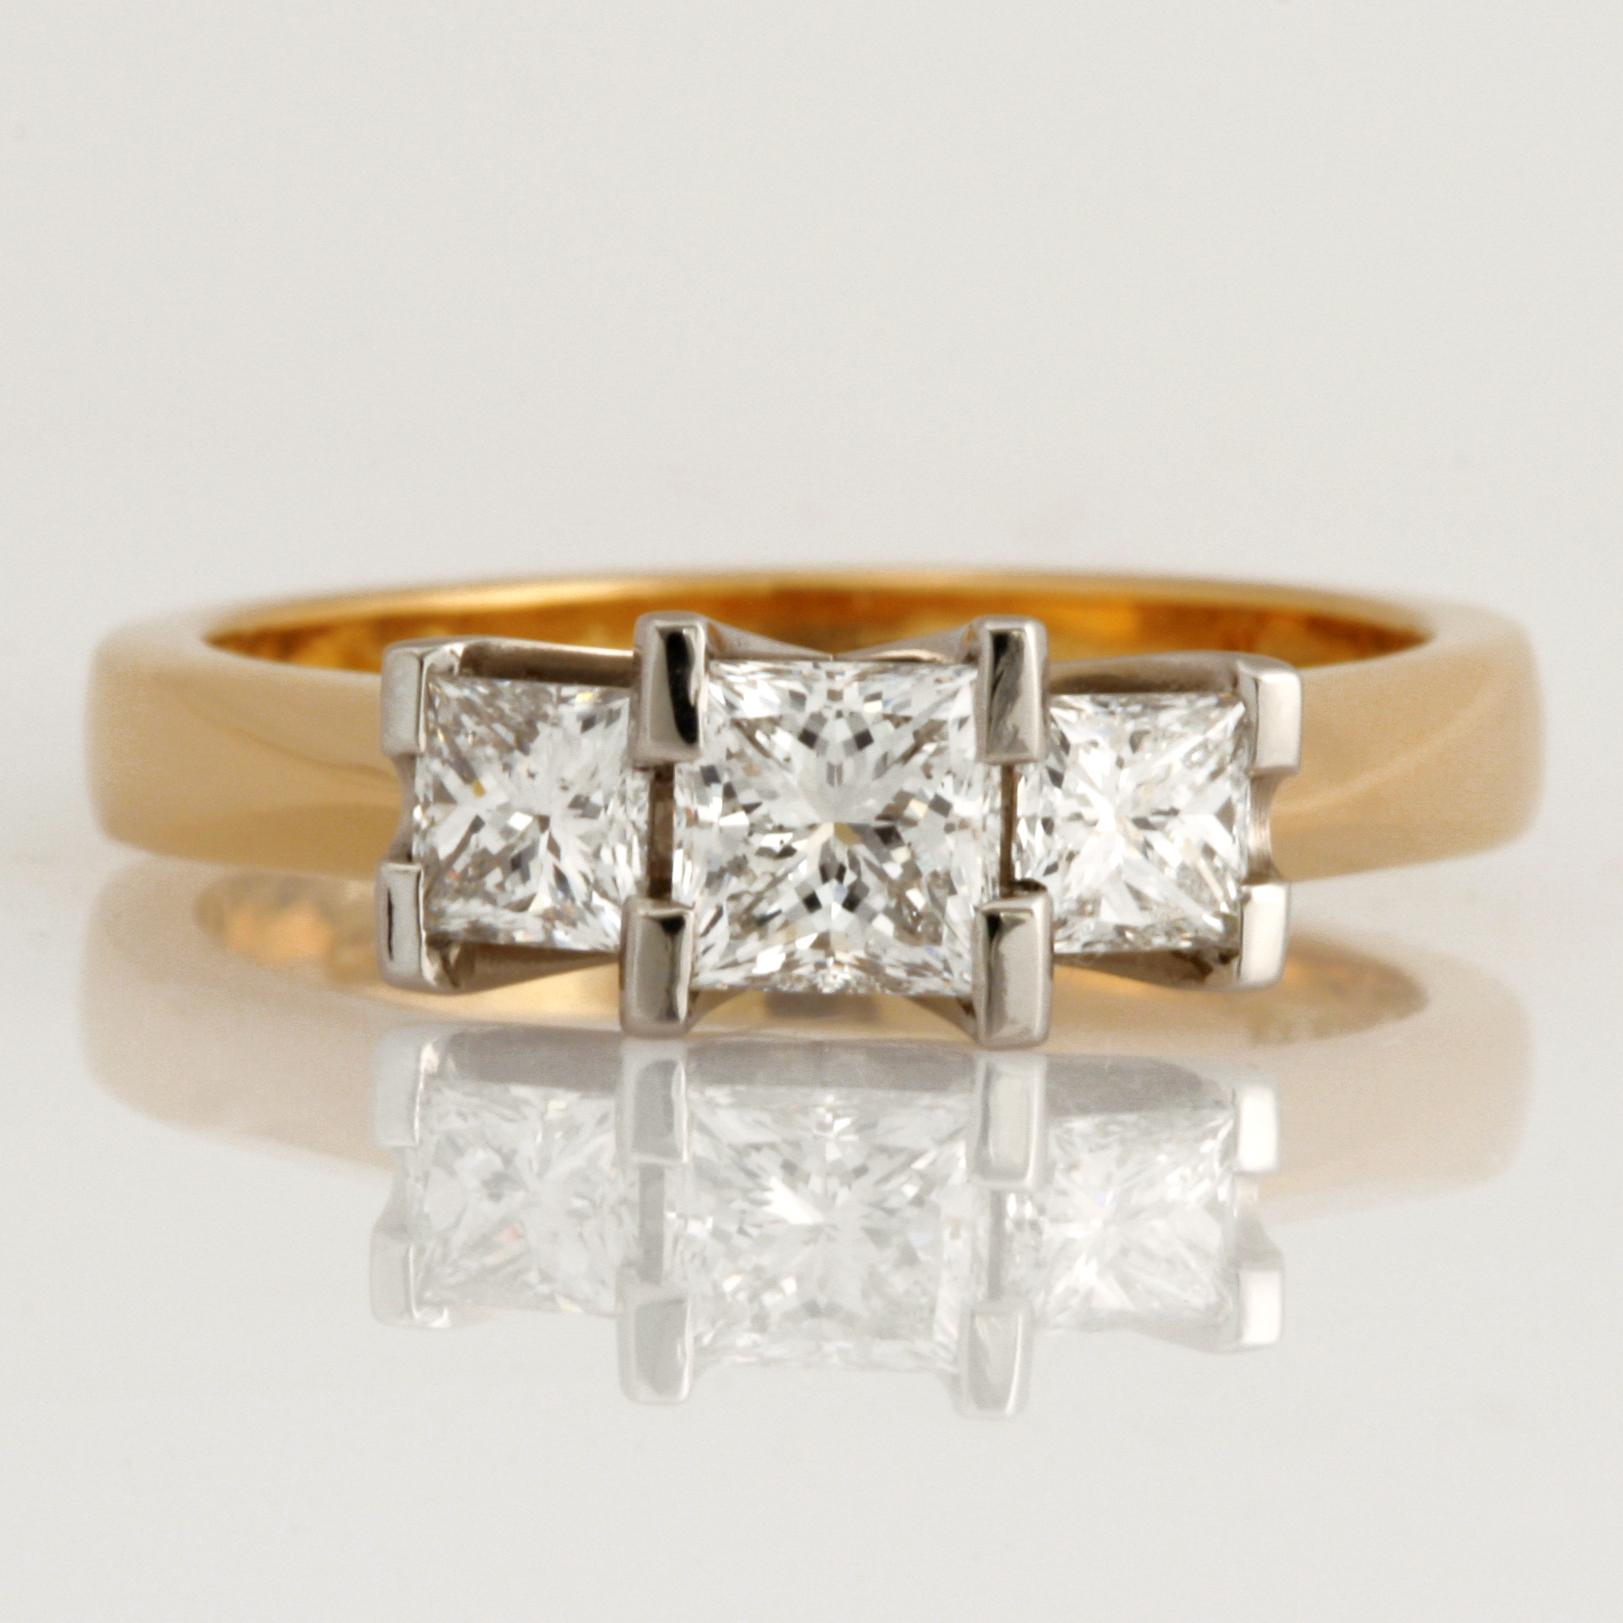 Handmade ladies 18ct yellow gold and platinum princess cut diamond engagement ring